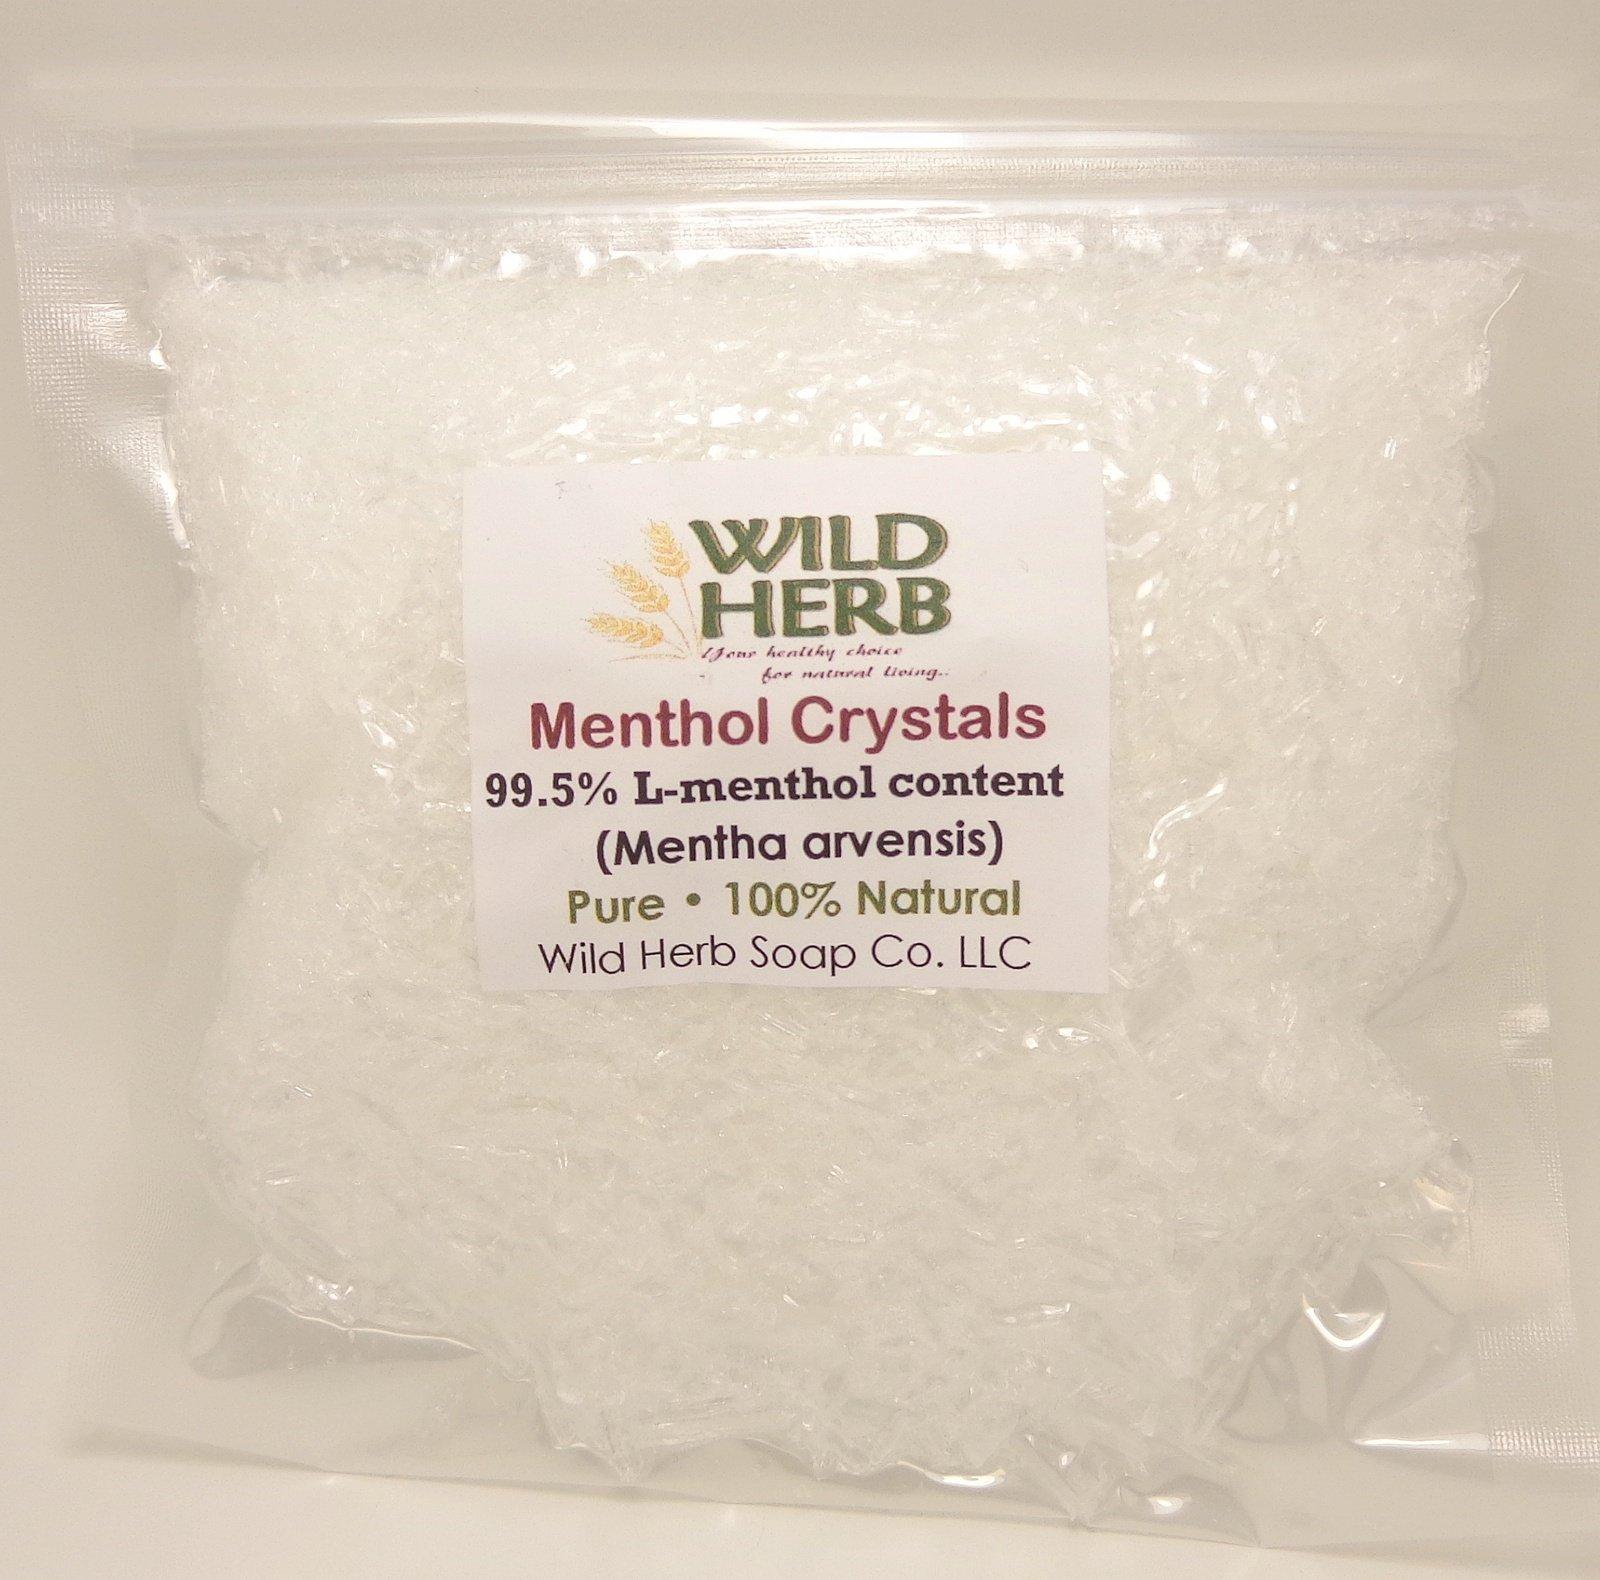 Menthol Crystals Organic